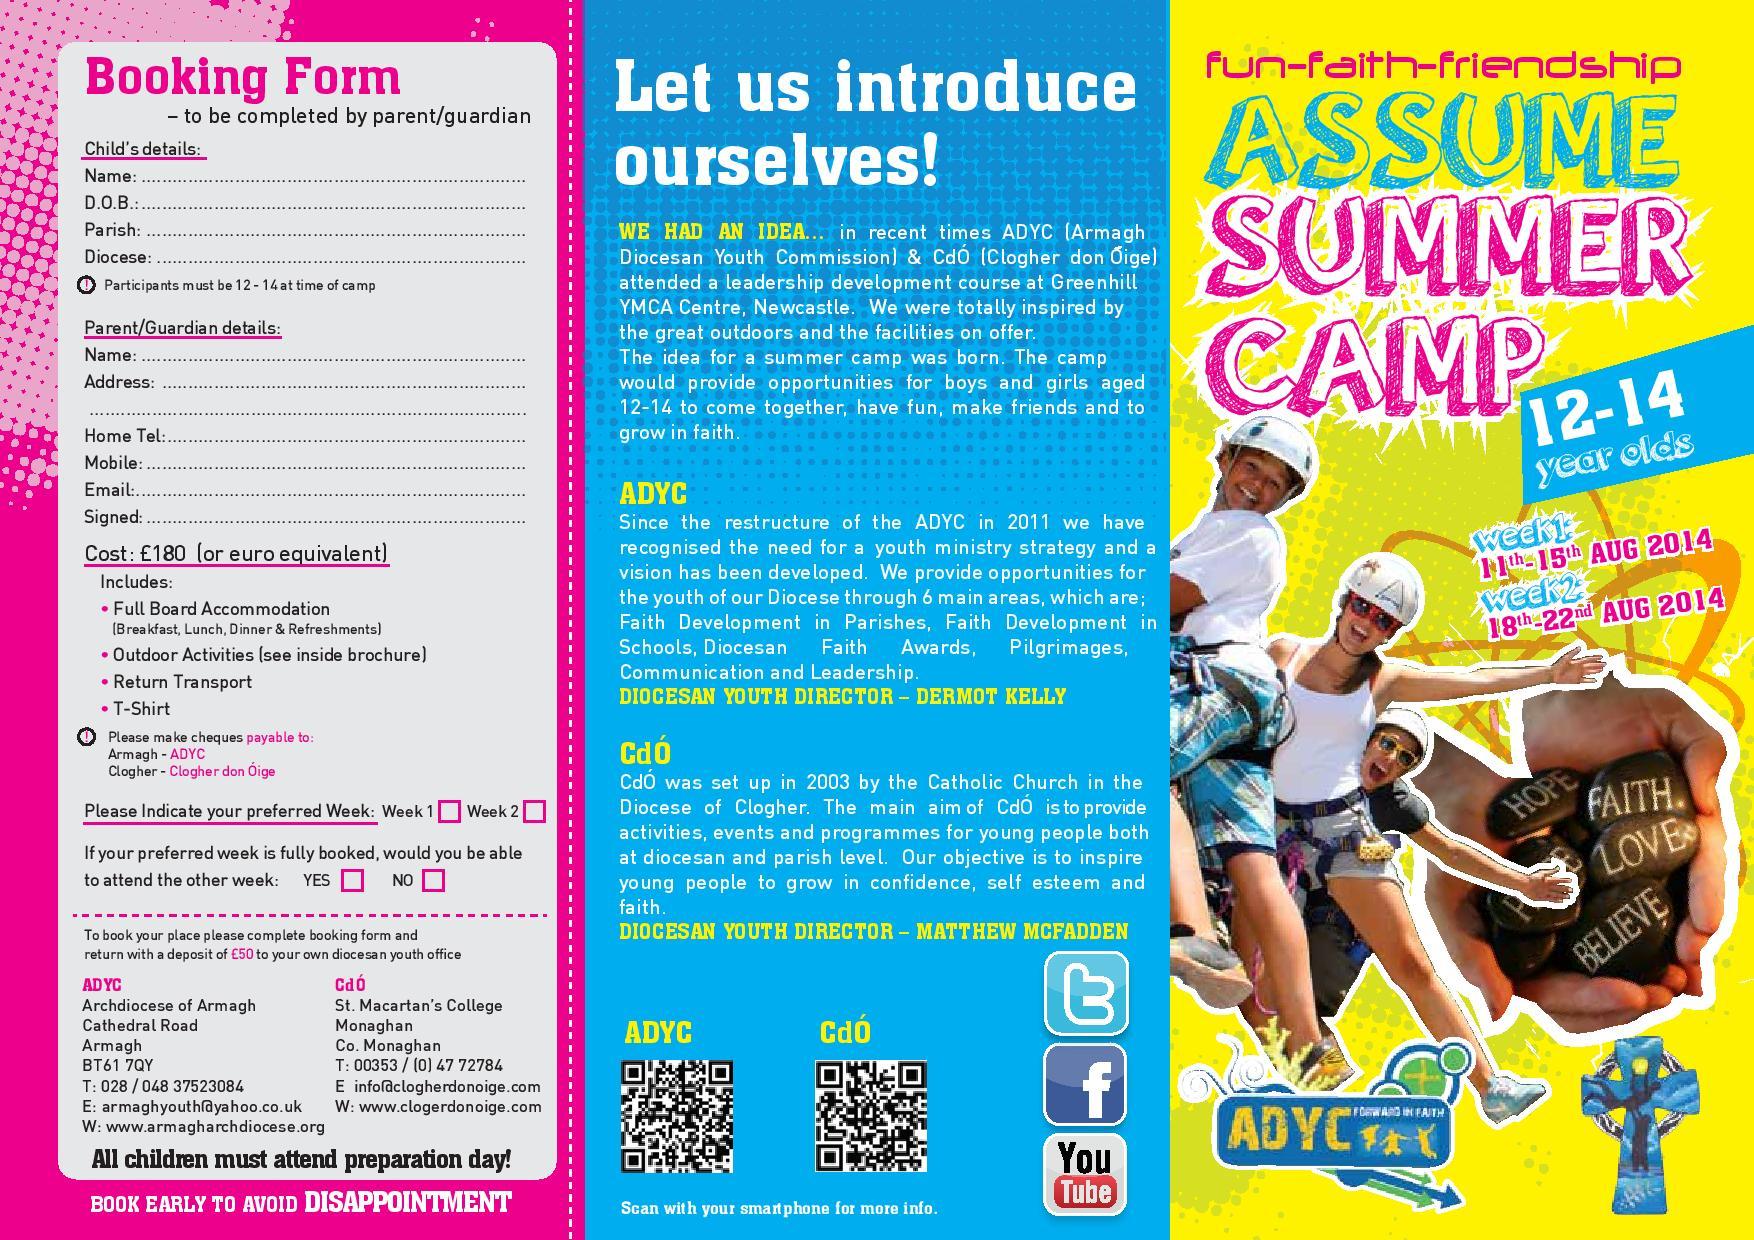 ADYC_Summer Camp 3 fold copy-page-001